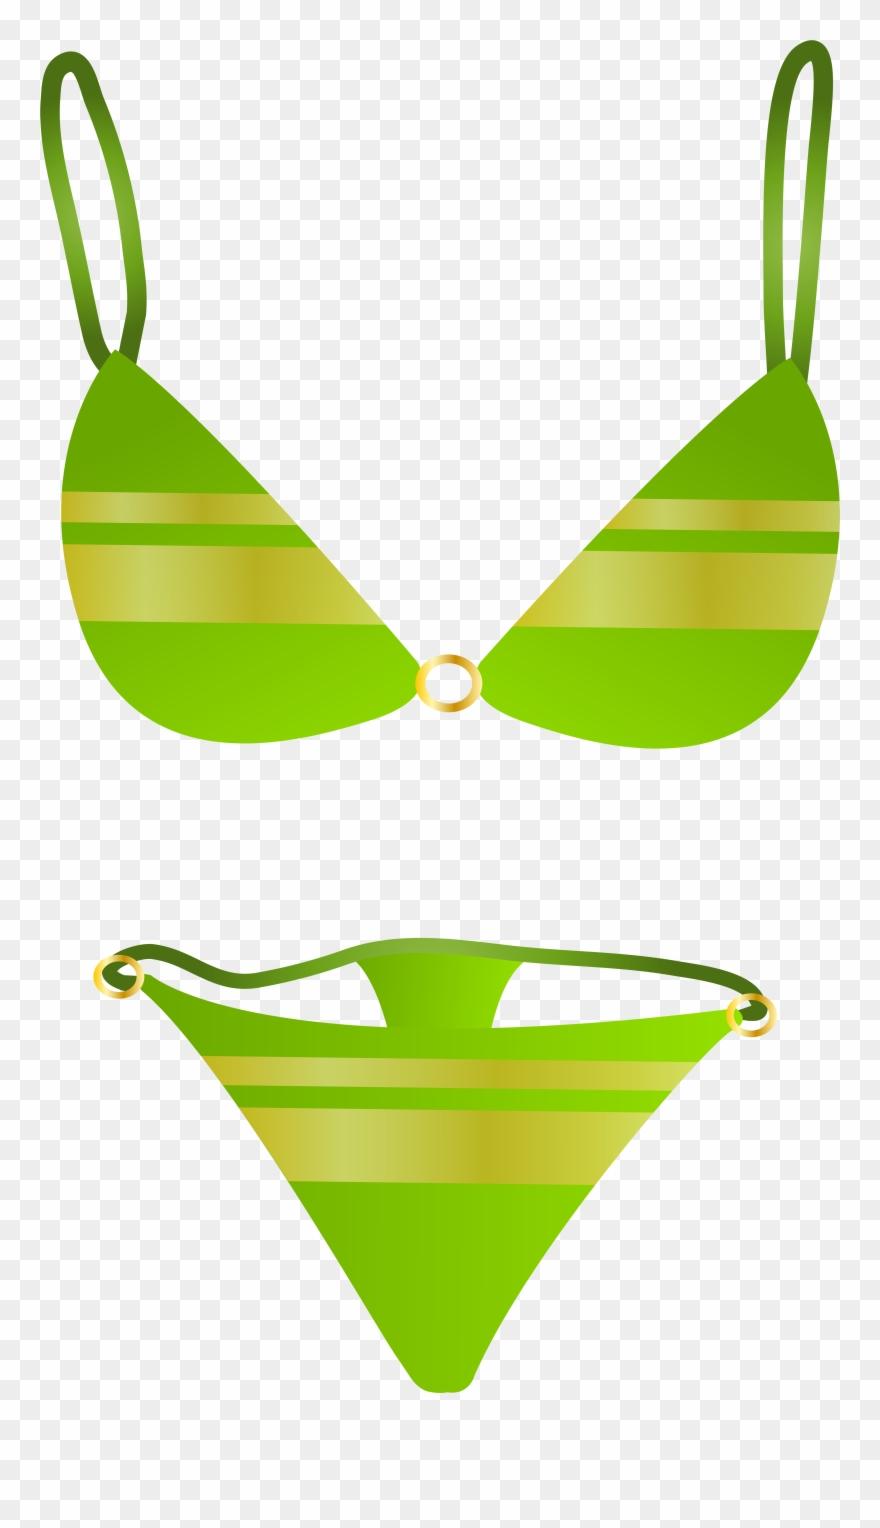 Bikini clipart transparent. Green swimsuit png clip